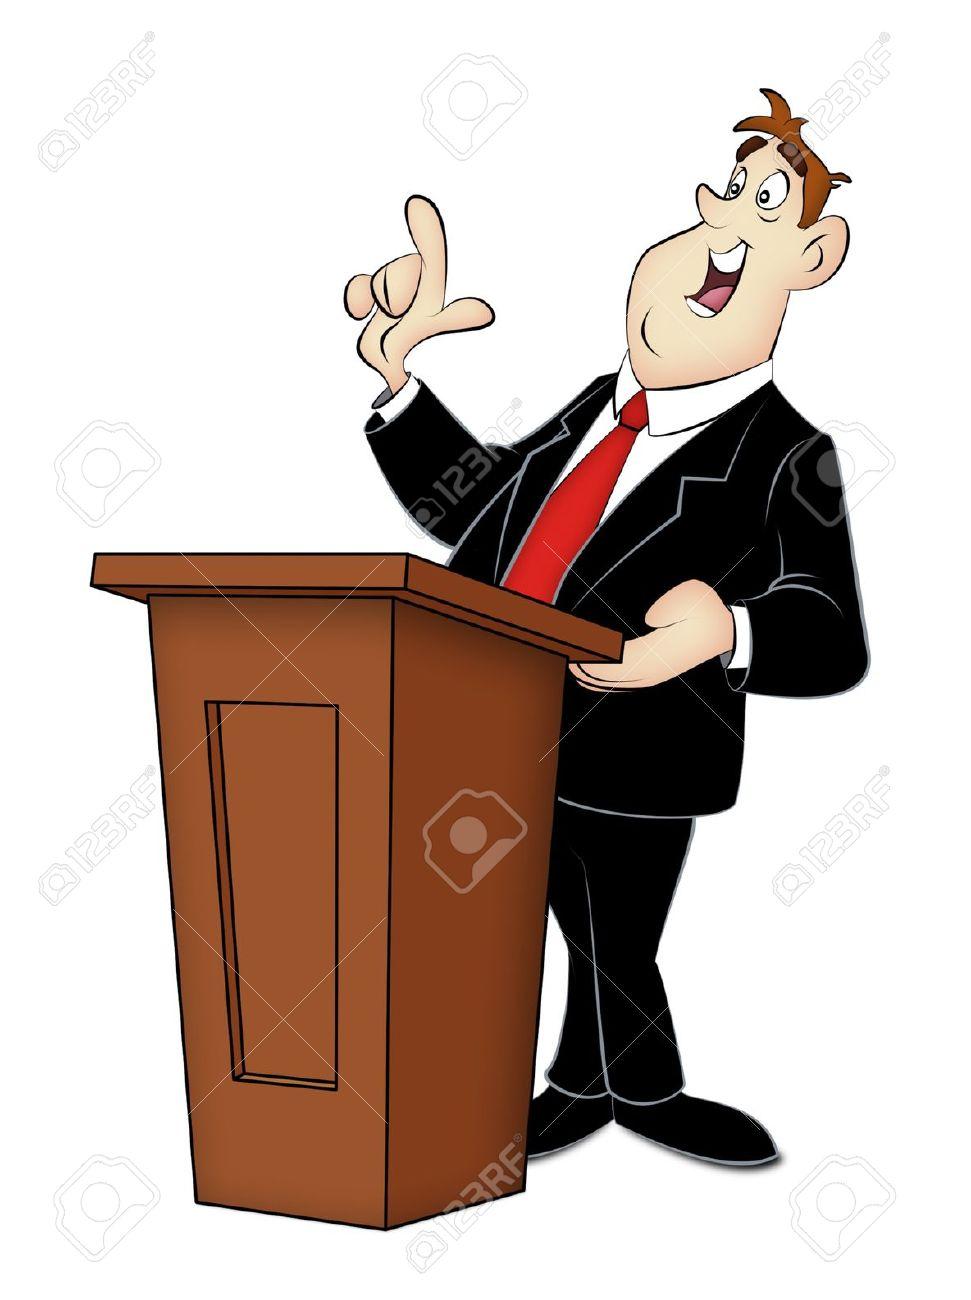 Cartoon speaker in business suit with rostrum. - 14128639